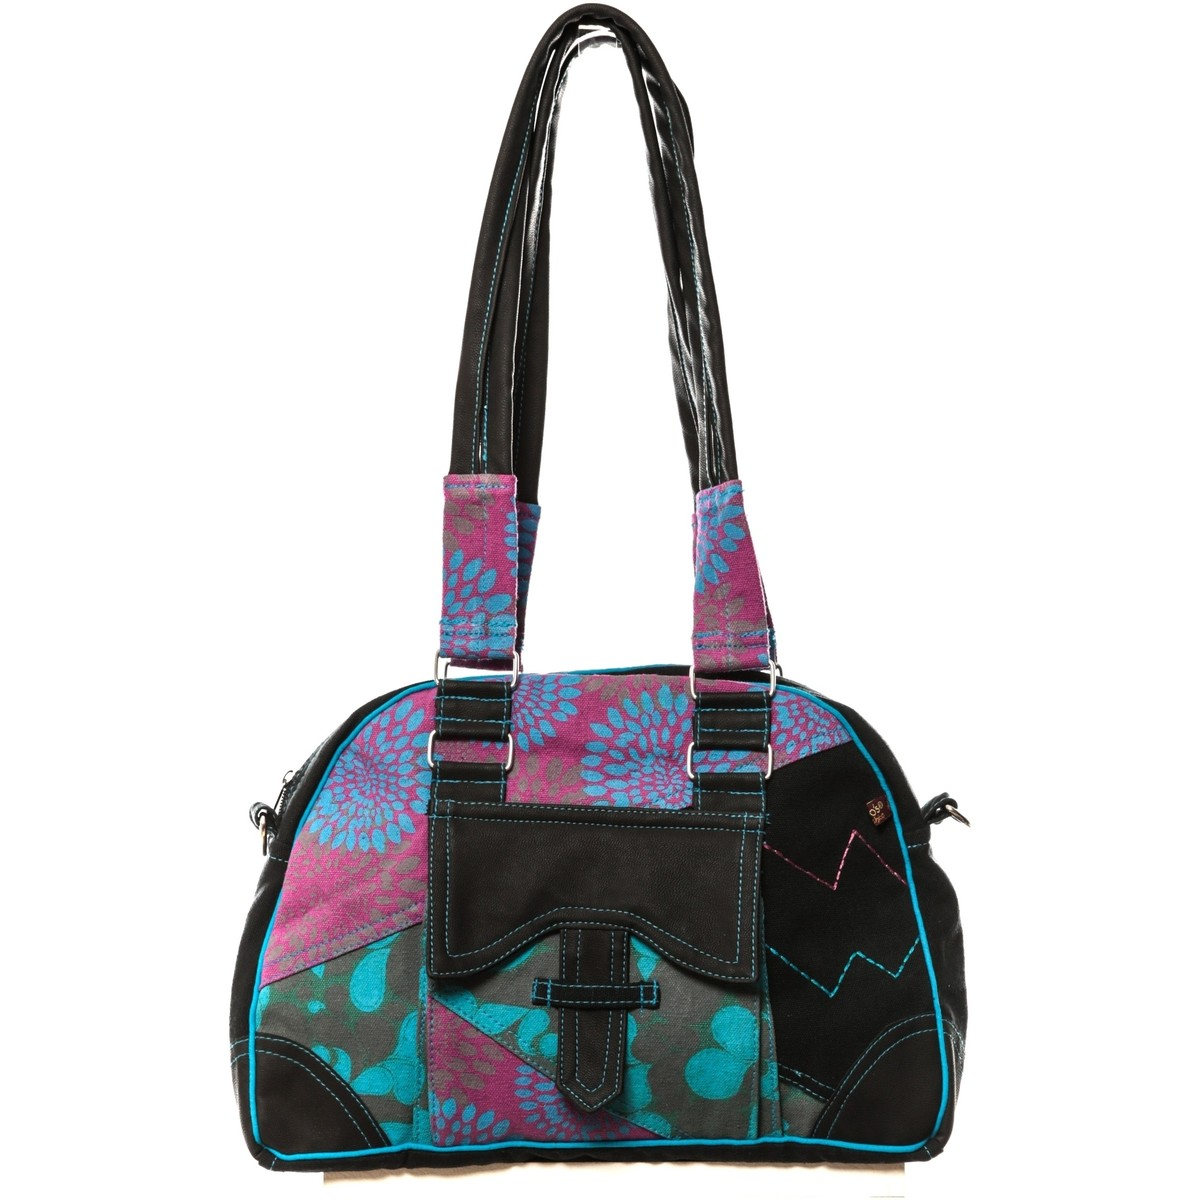 bamboo 39 s fashion sac main miami gn 145 bleu violet multicolor sacs sacs port paule femme. Black Bedroom Furniture Sets. Home Design Ideas